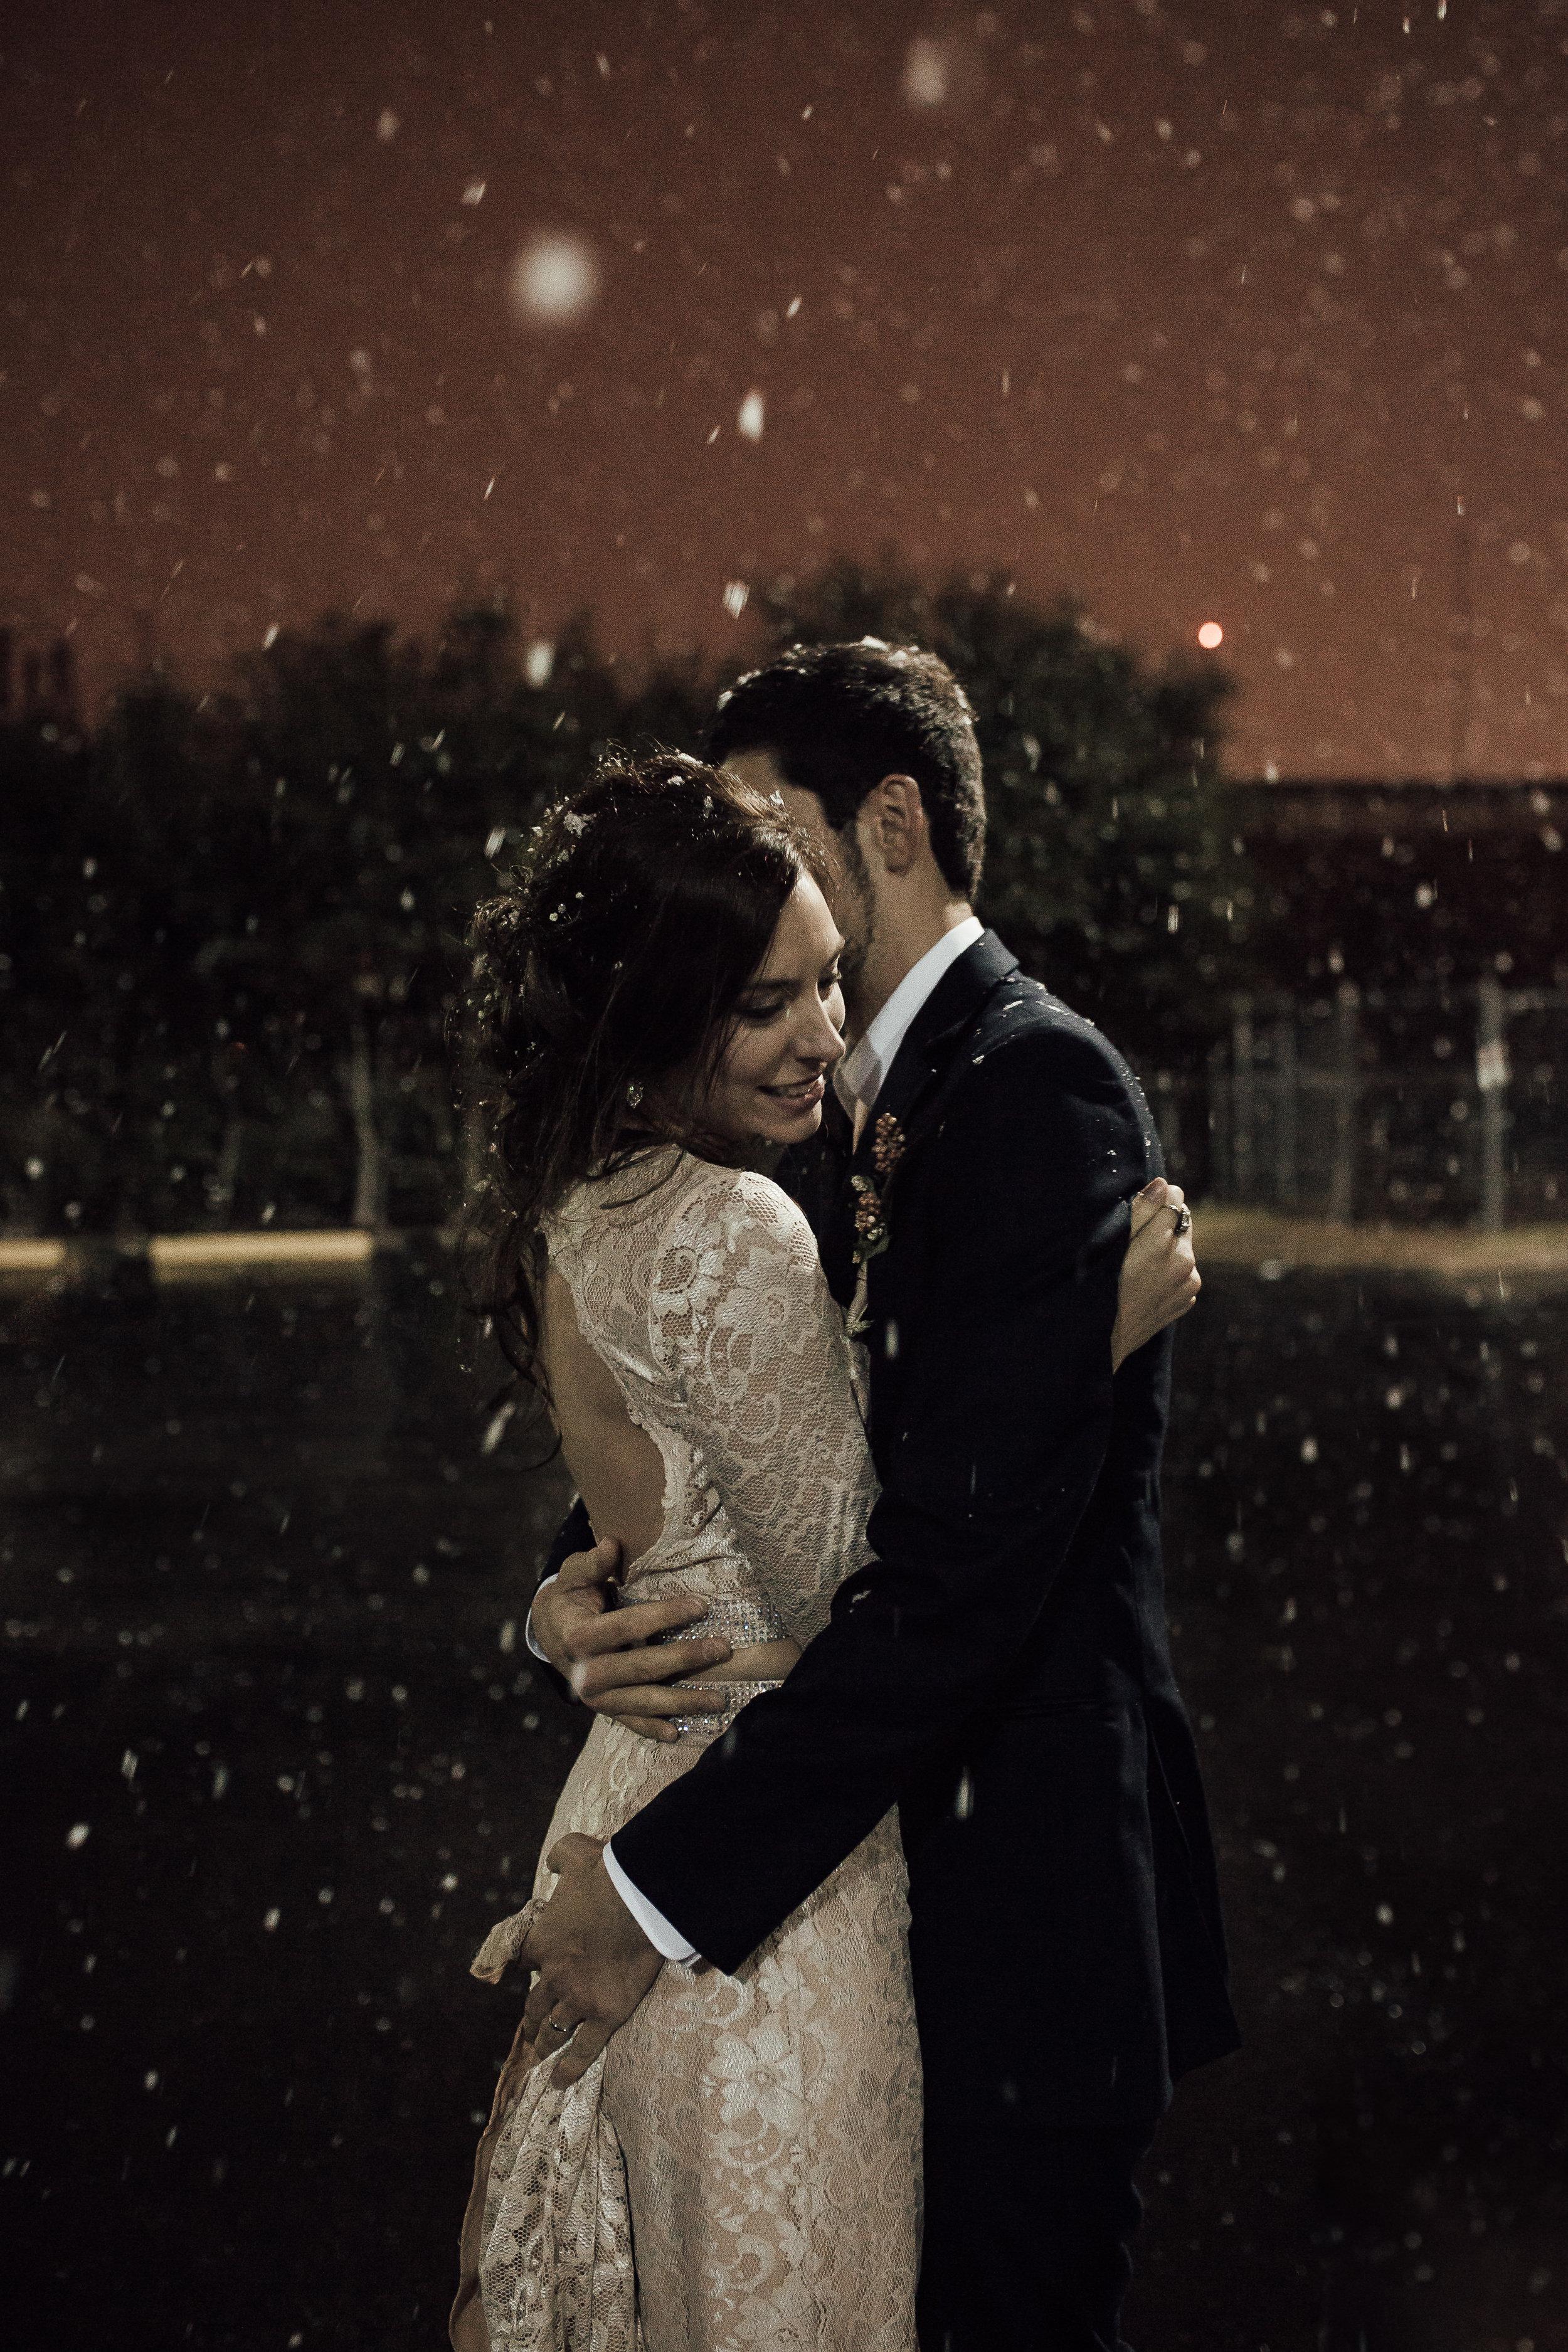 cassie-cook-photographer-intimate-ceremony-elopement-white-wedding-winter-wedding